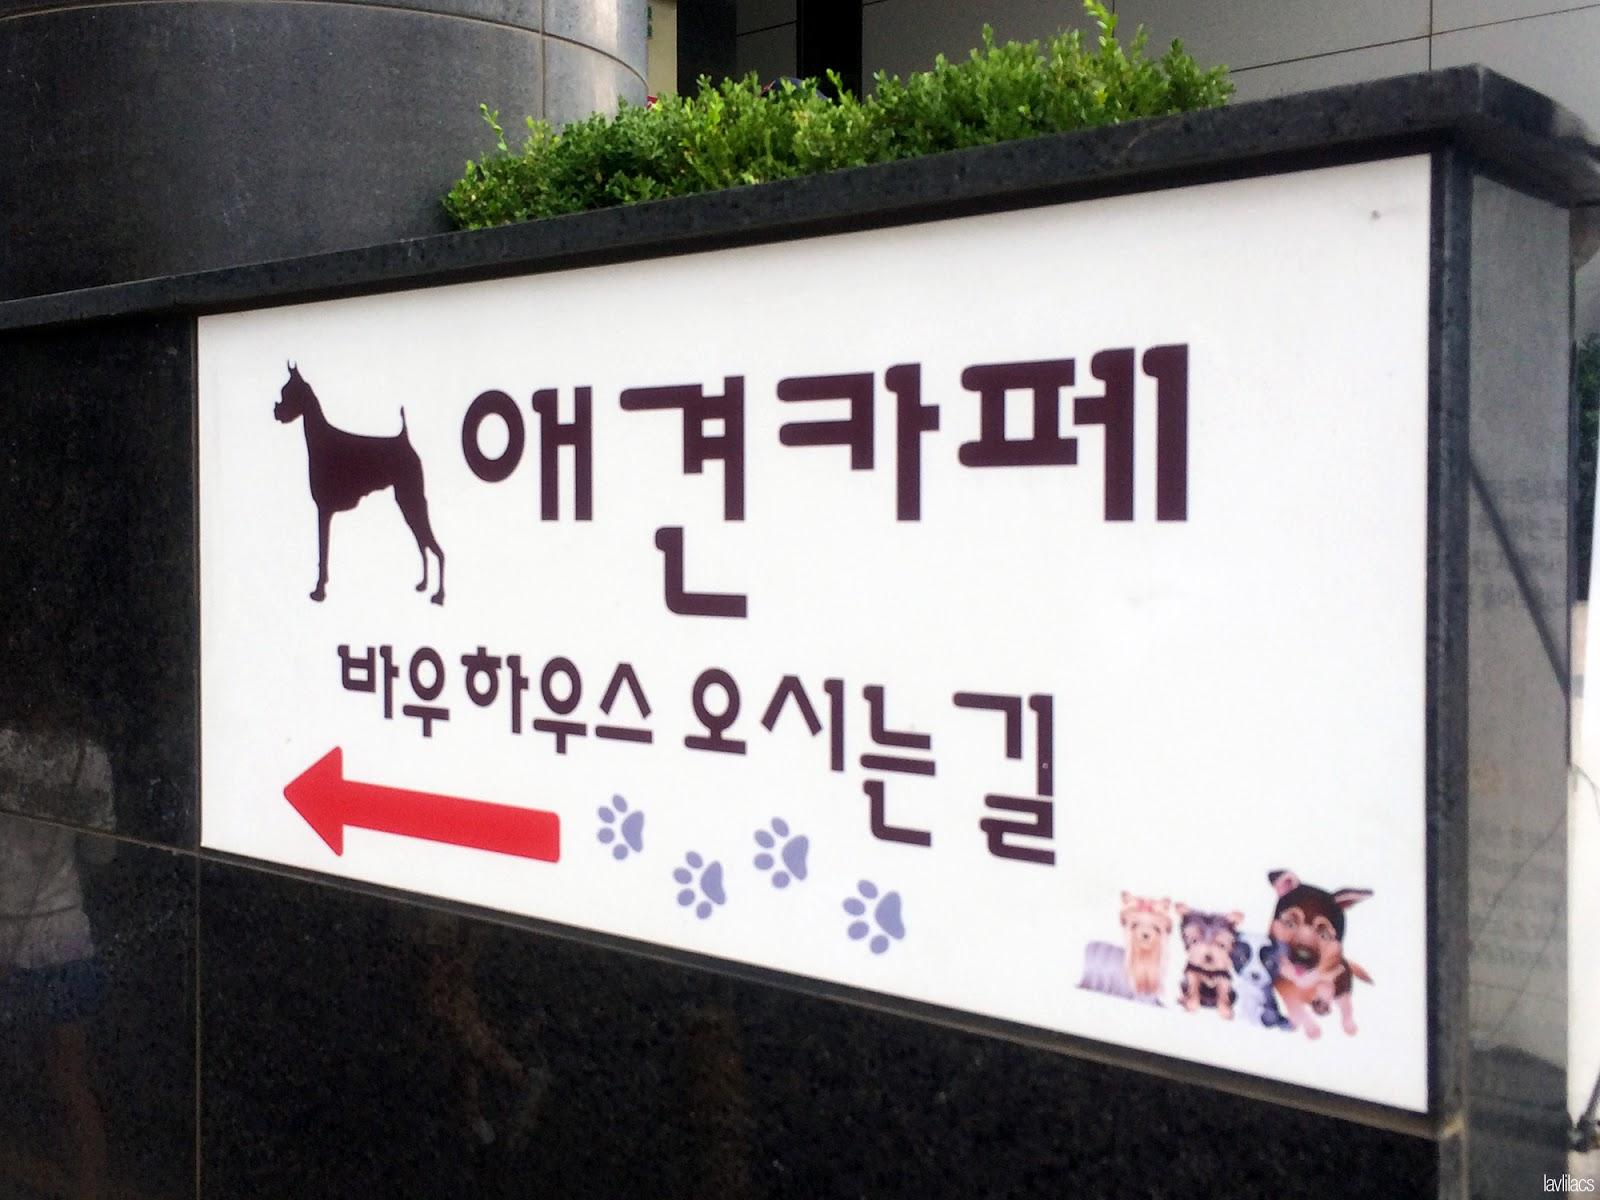 Seoul, Korea - Summer Study Abroad 2014 - Bauhaus Dog Cafe entrance sign